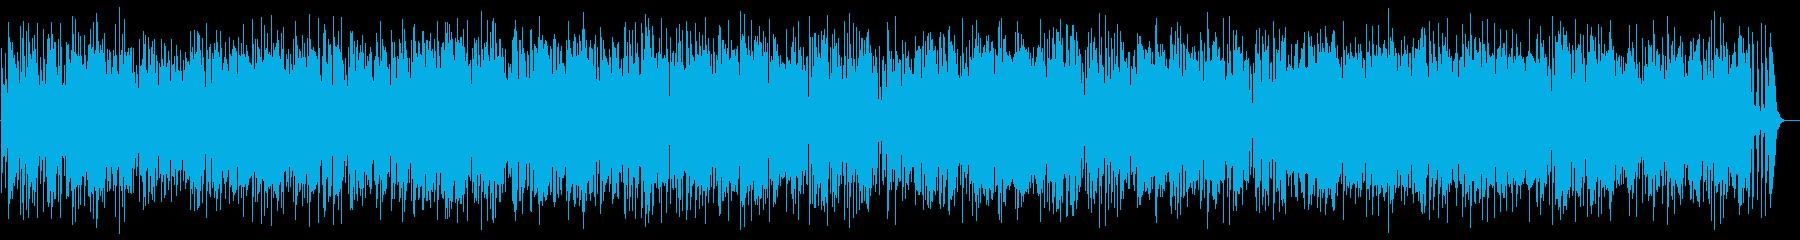 "Nocturne E major ""Nocturne No. 2""'s reproduced waveform"